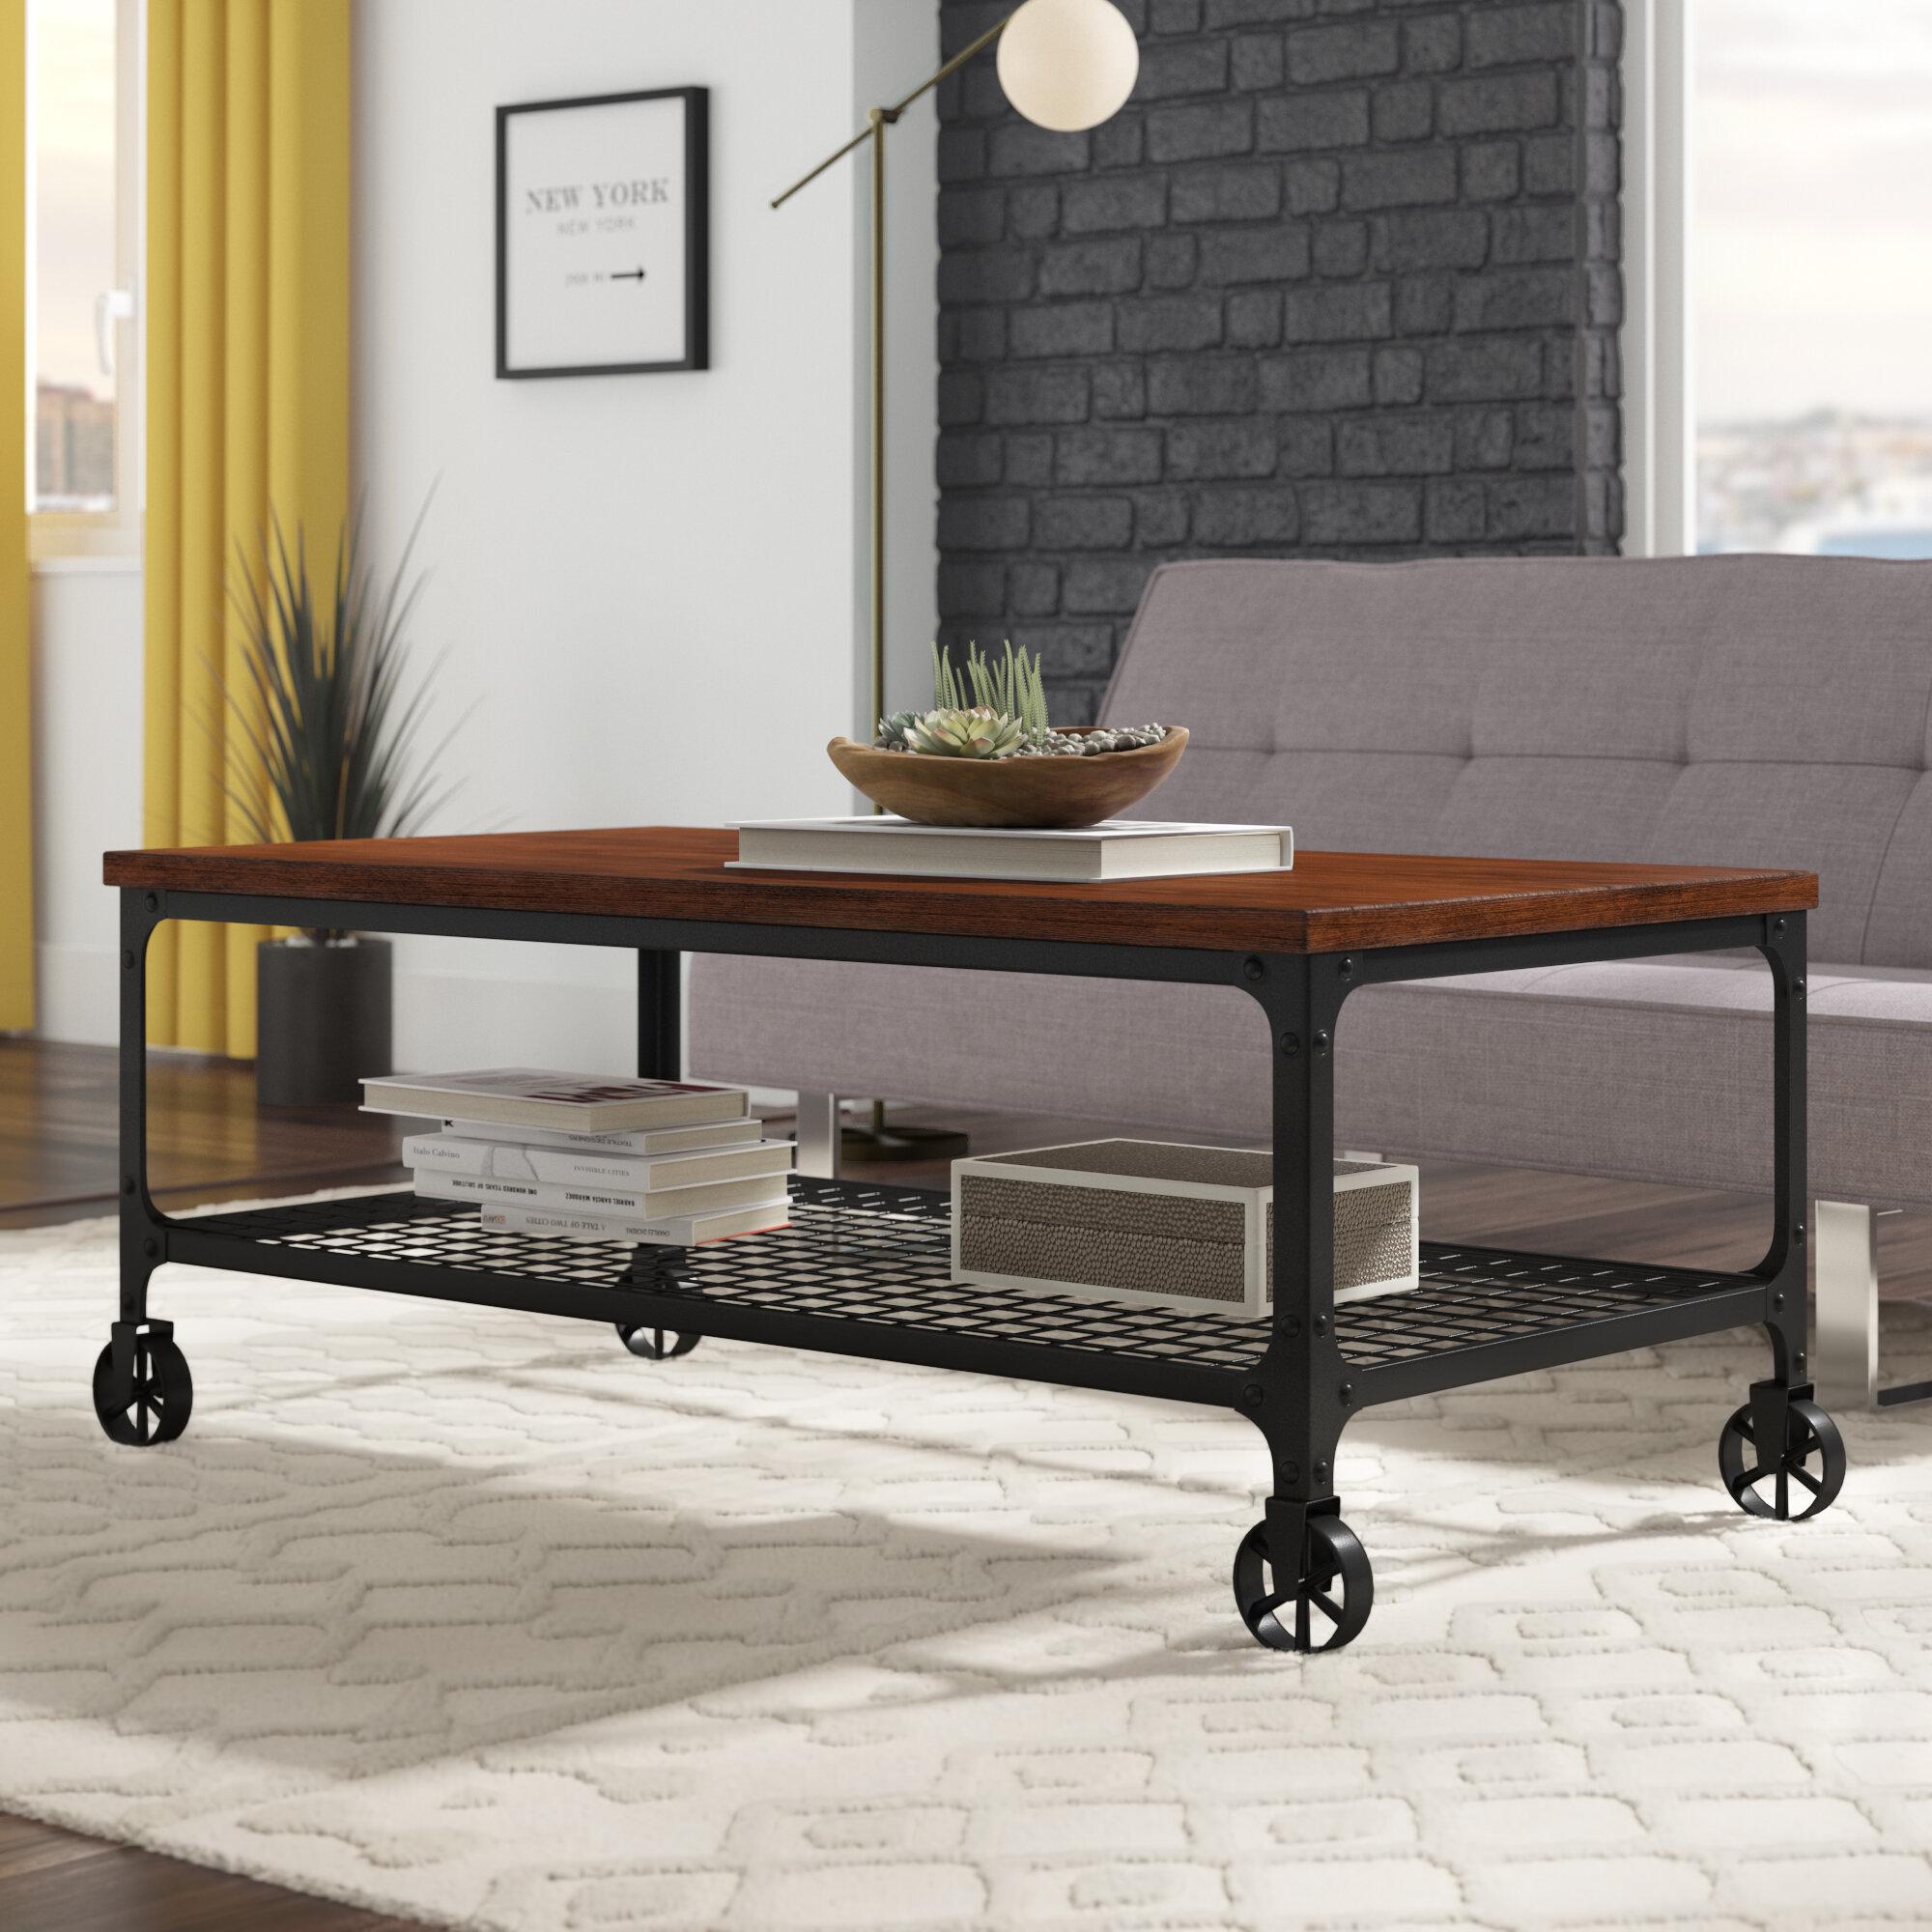 Williston forge alpert industrial coffee table reviews wayfair